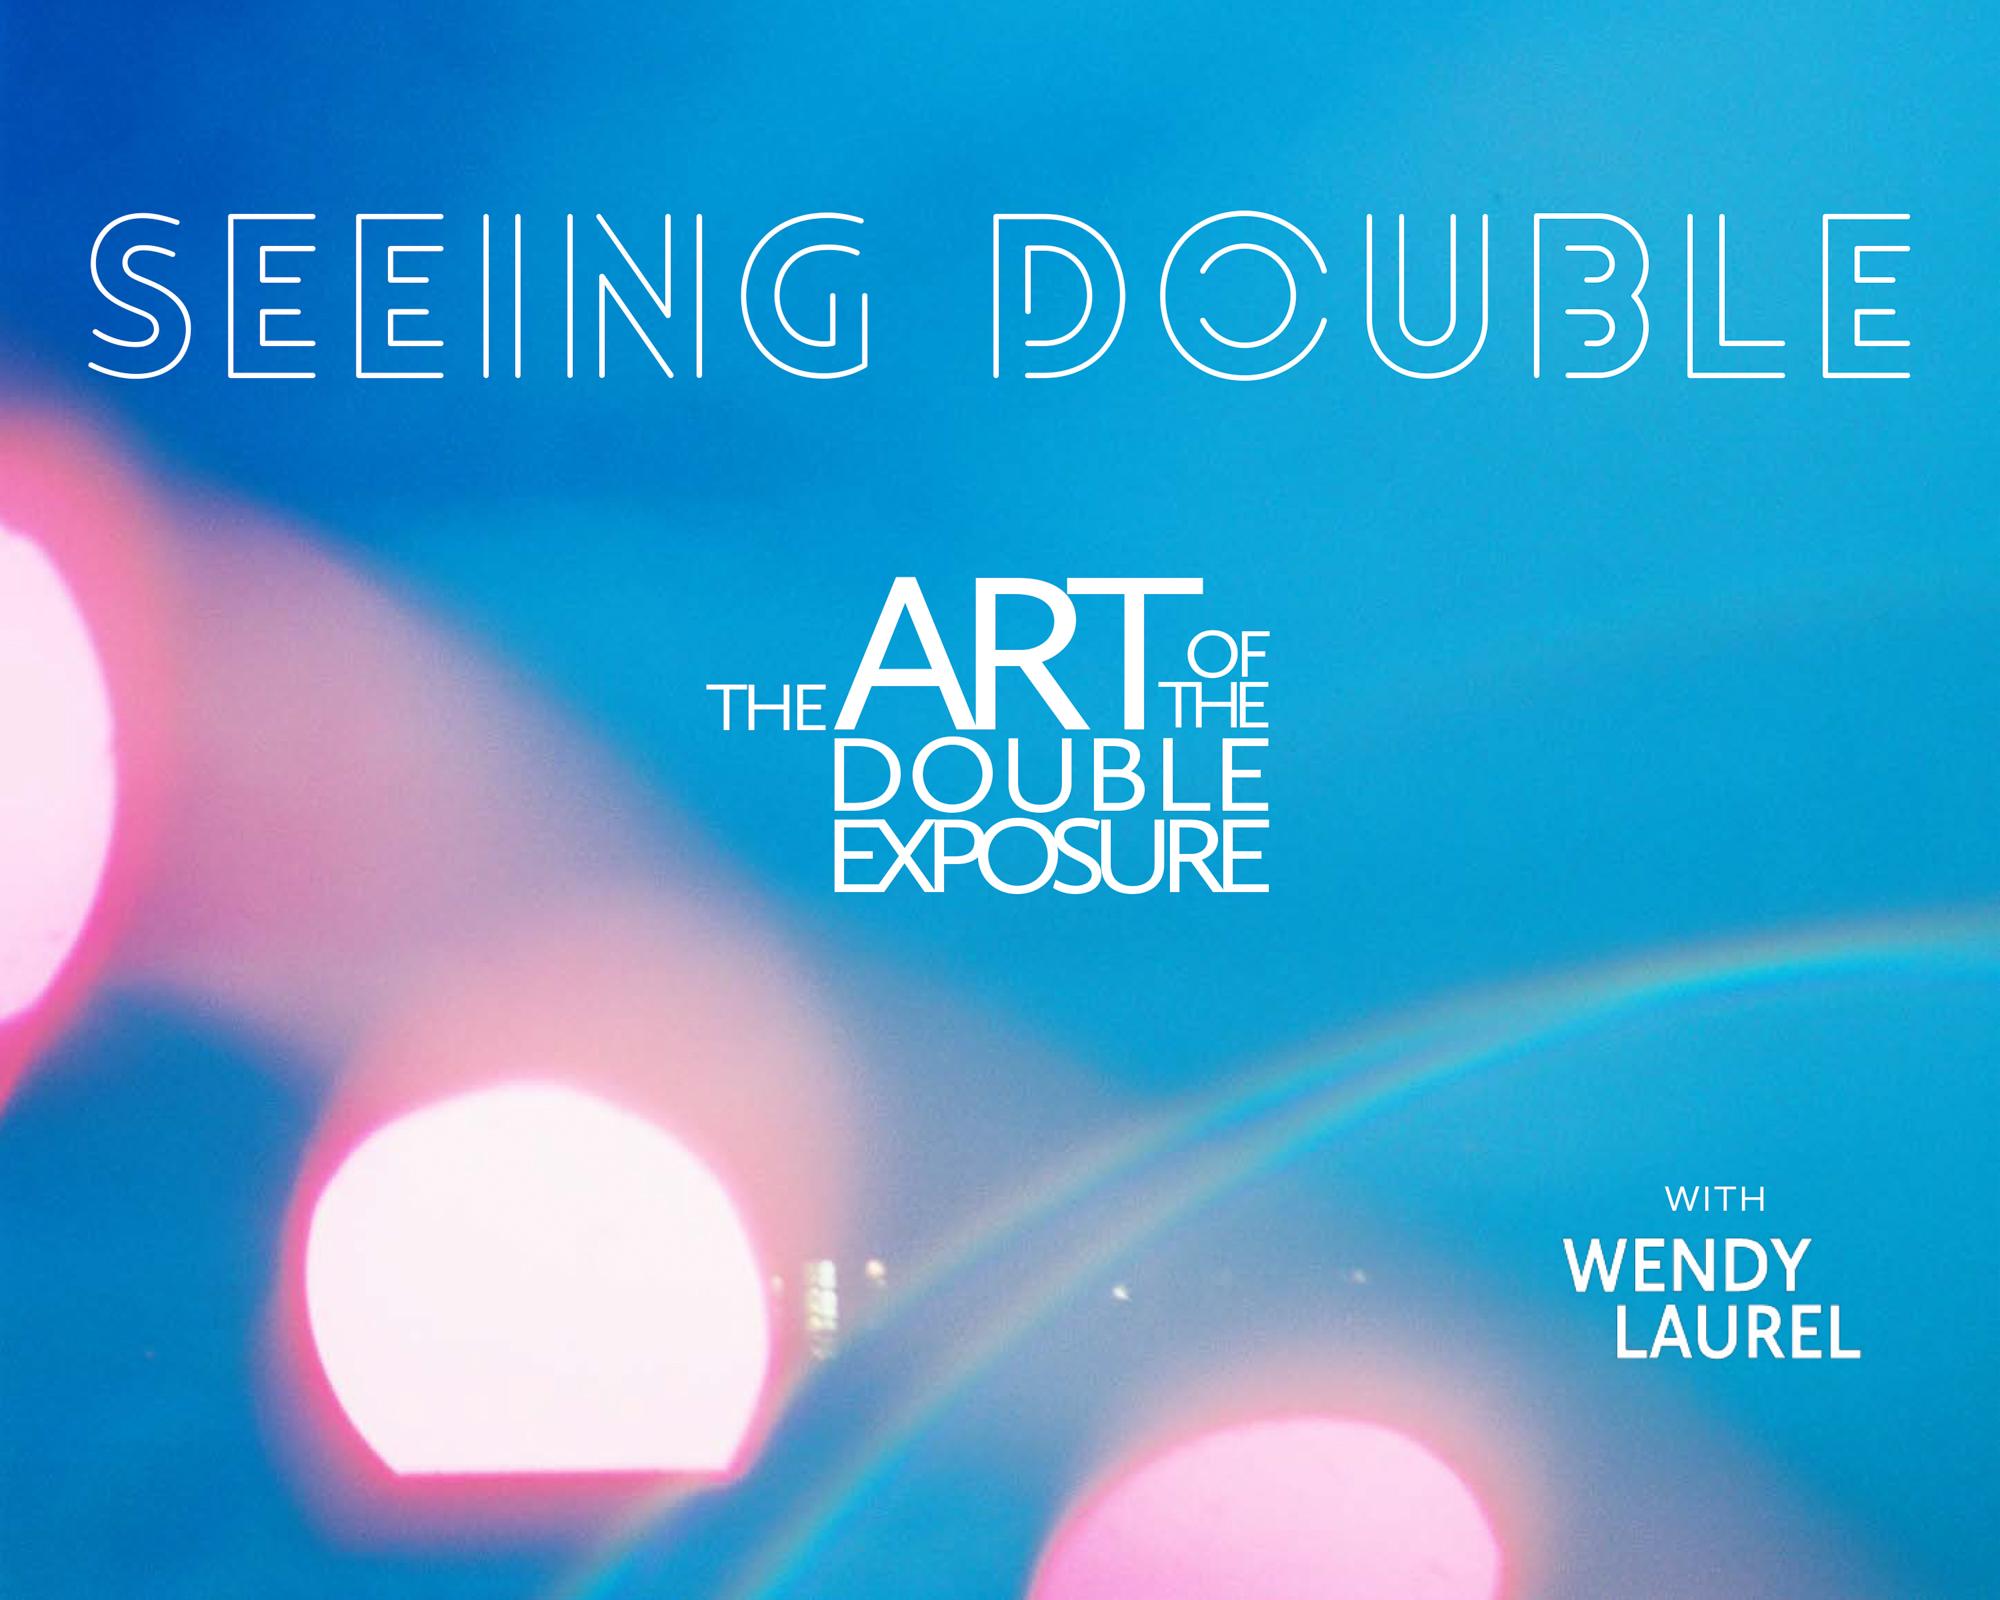 the art of double exposures by wendy laurel